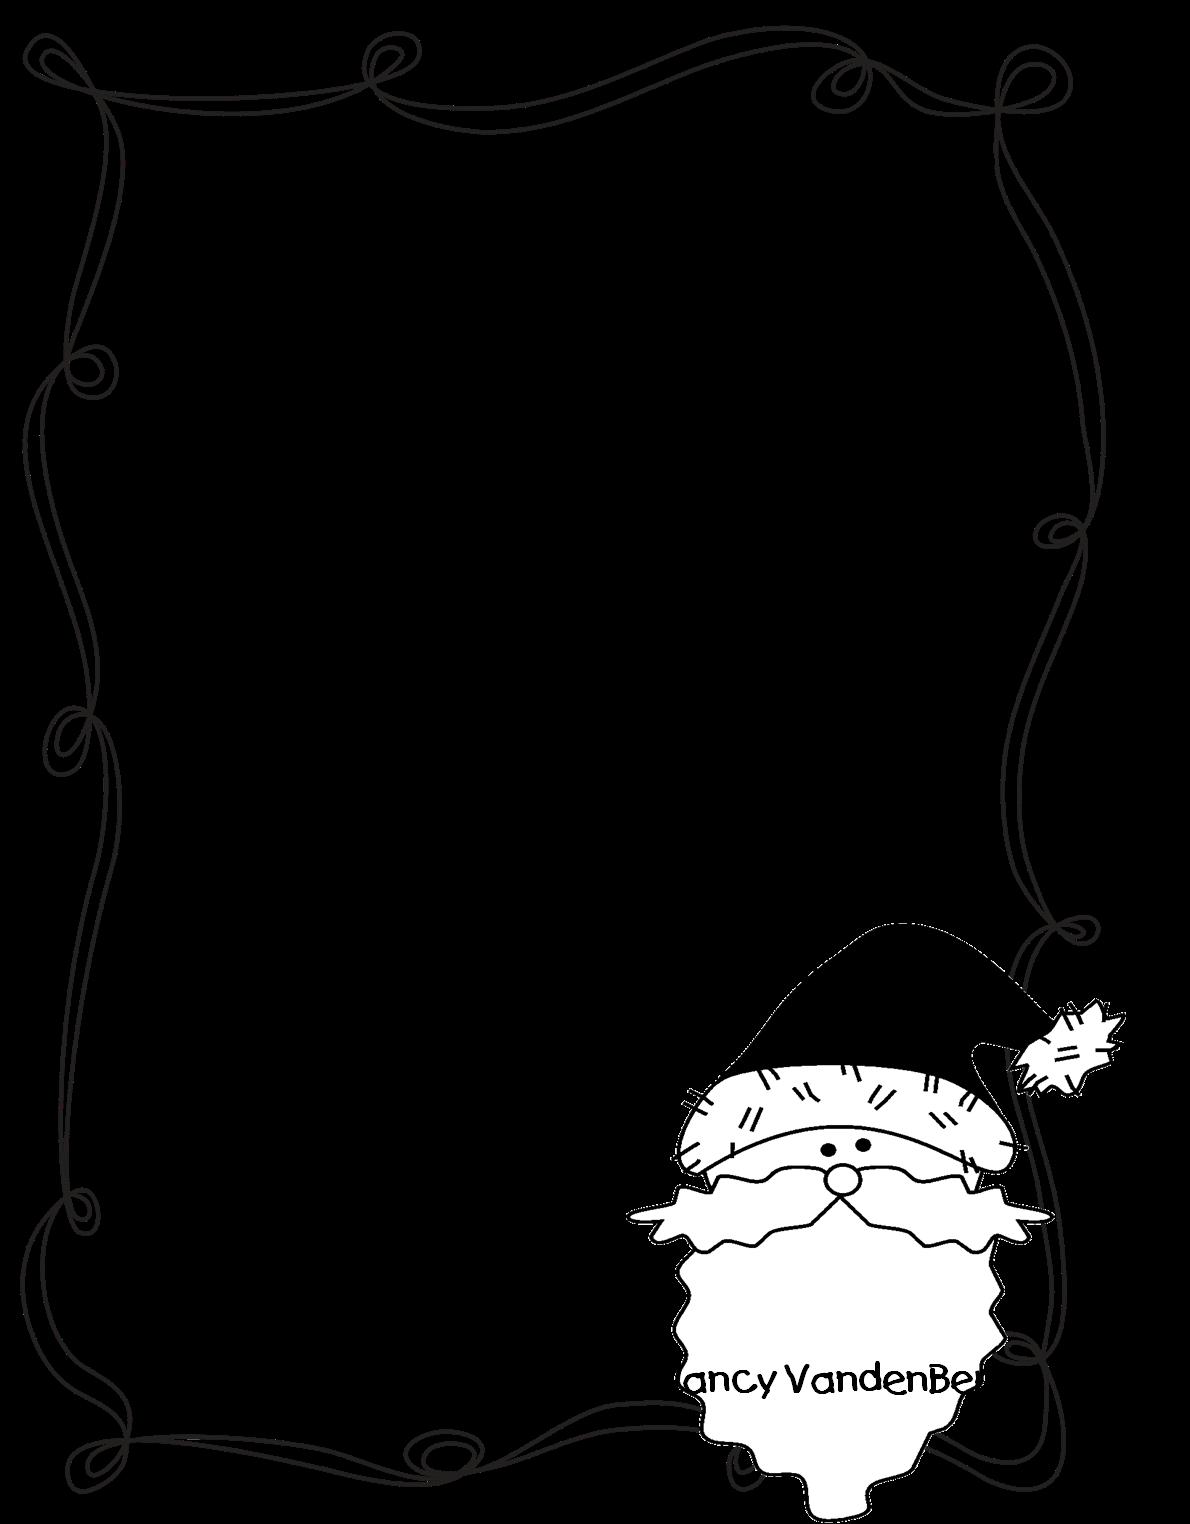 lyrics how the grinch stole christmas boris karloff